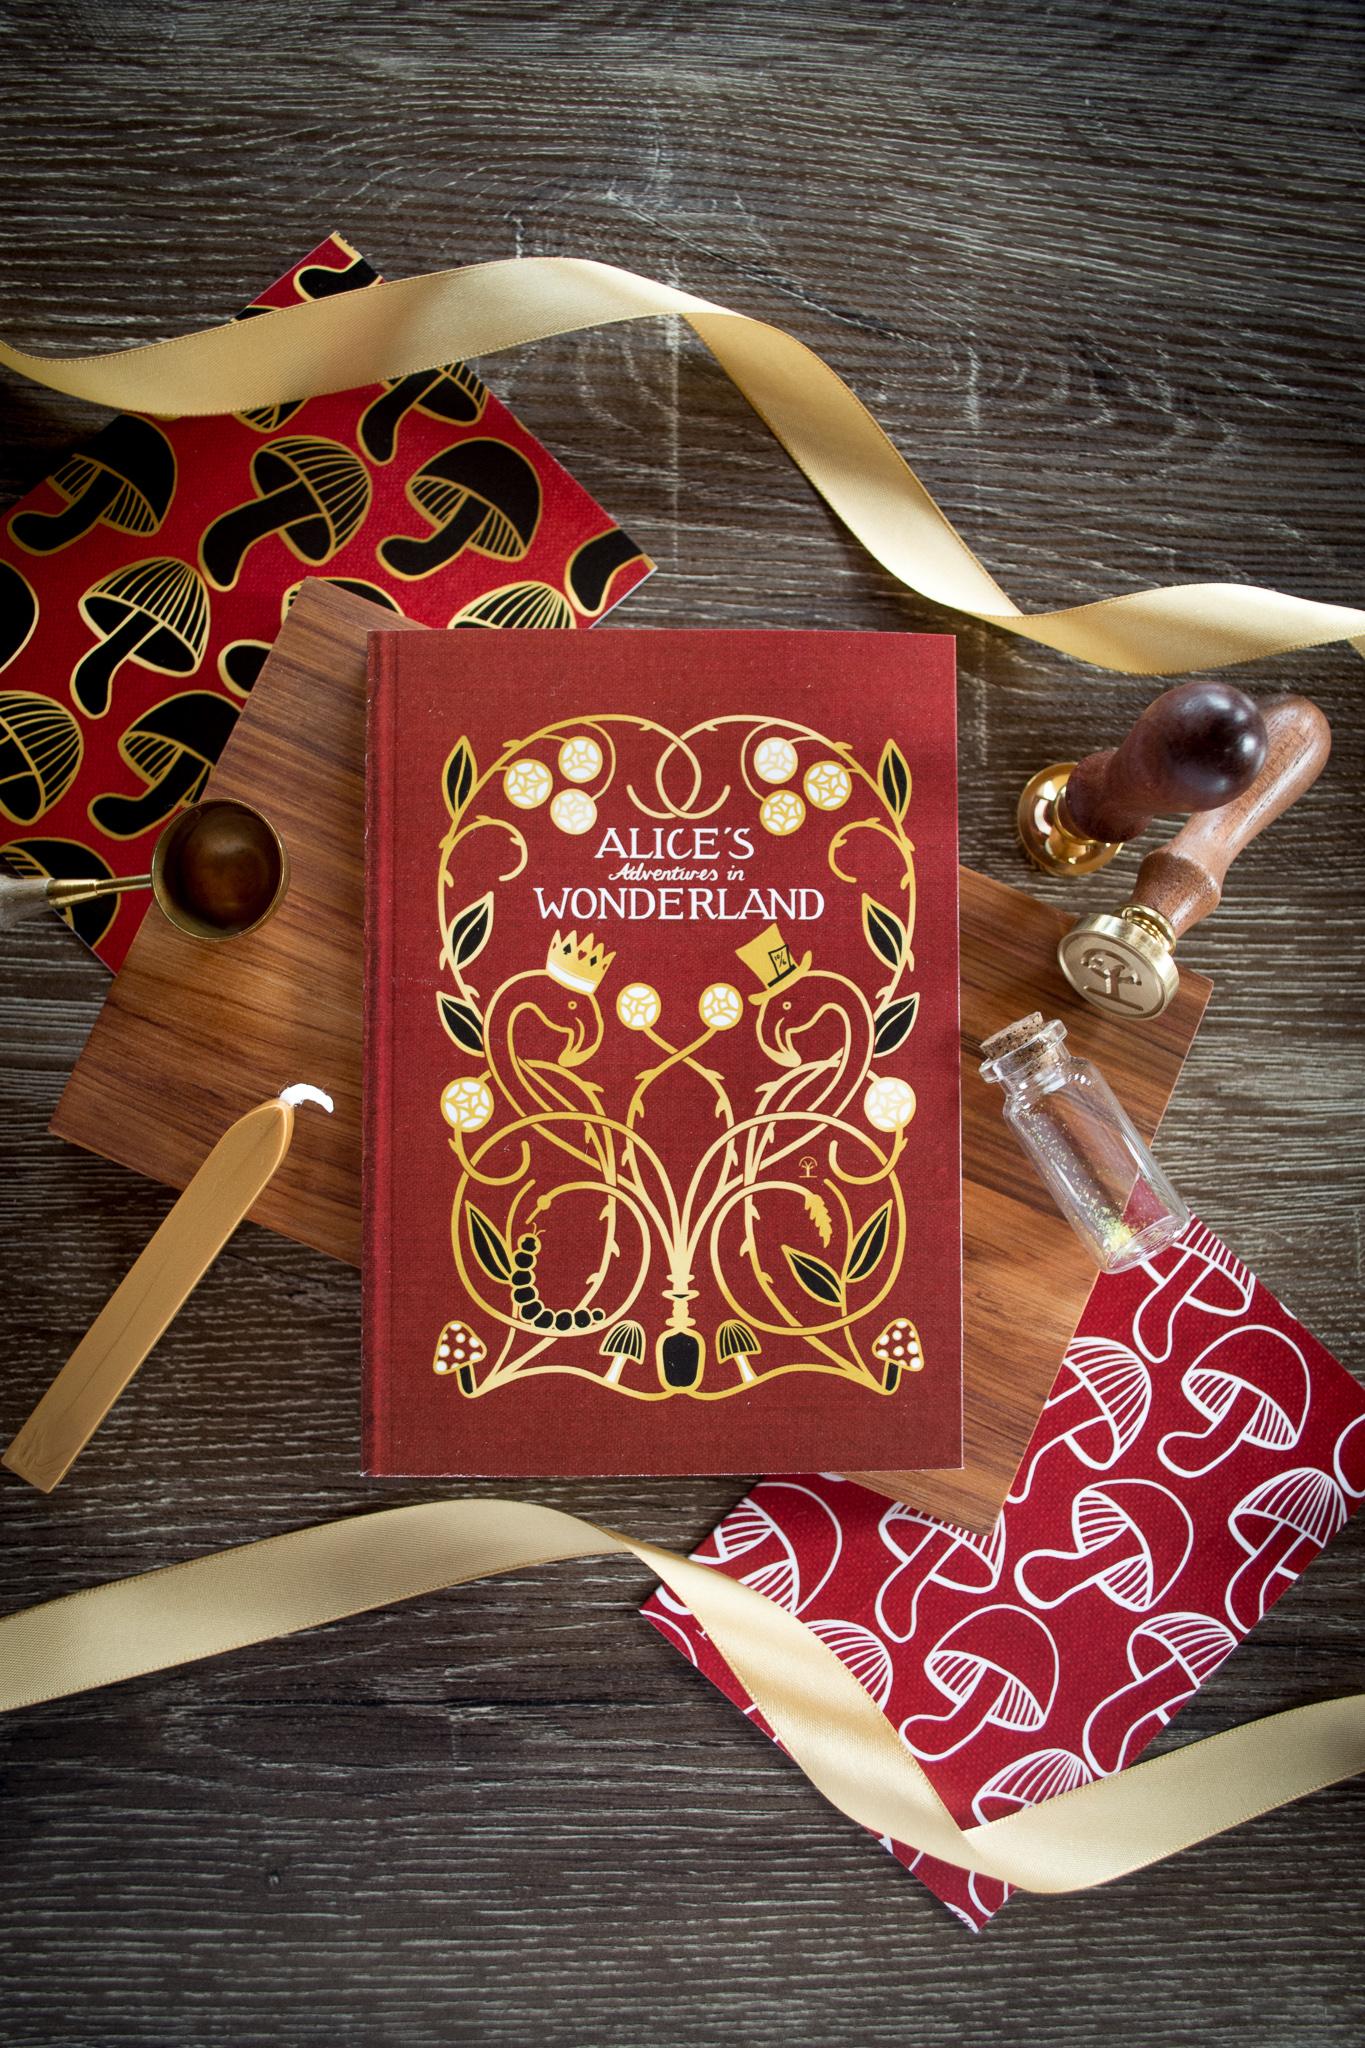 alice_wonderland_book_cover_notebook_holly_dunn_design.jpg